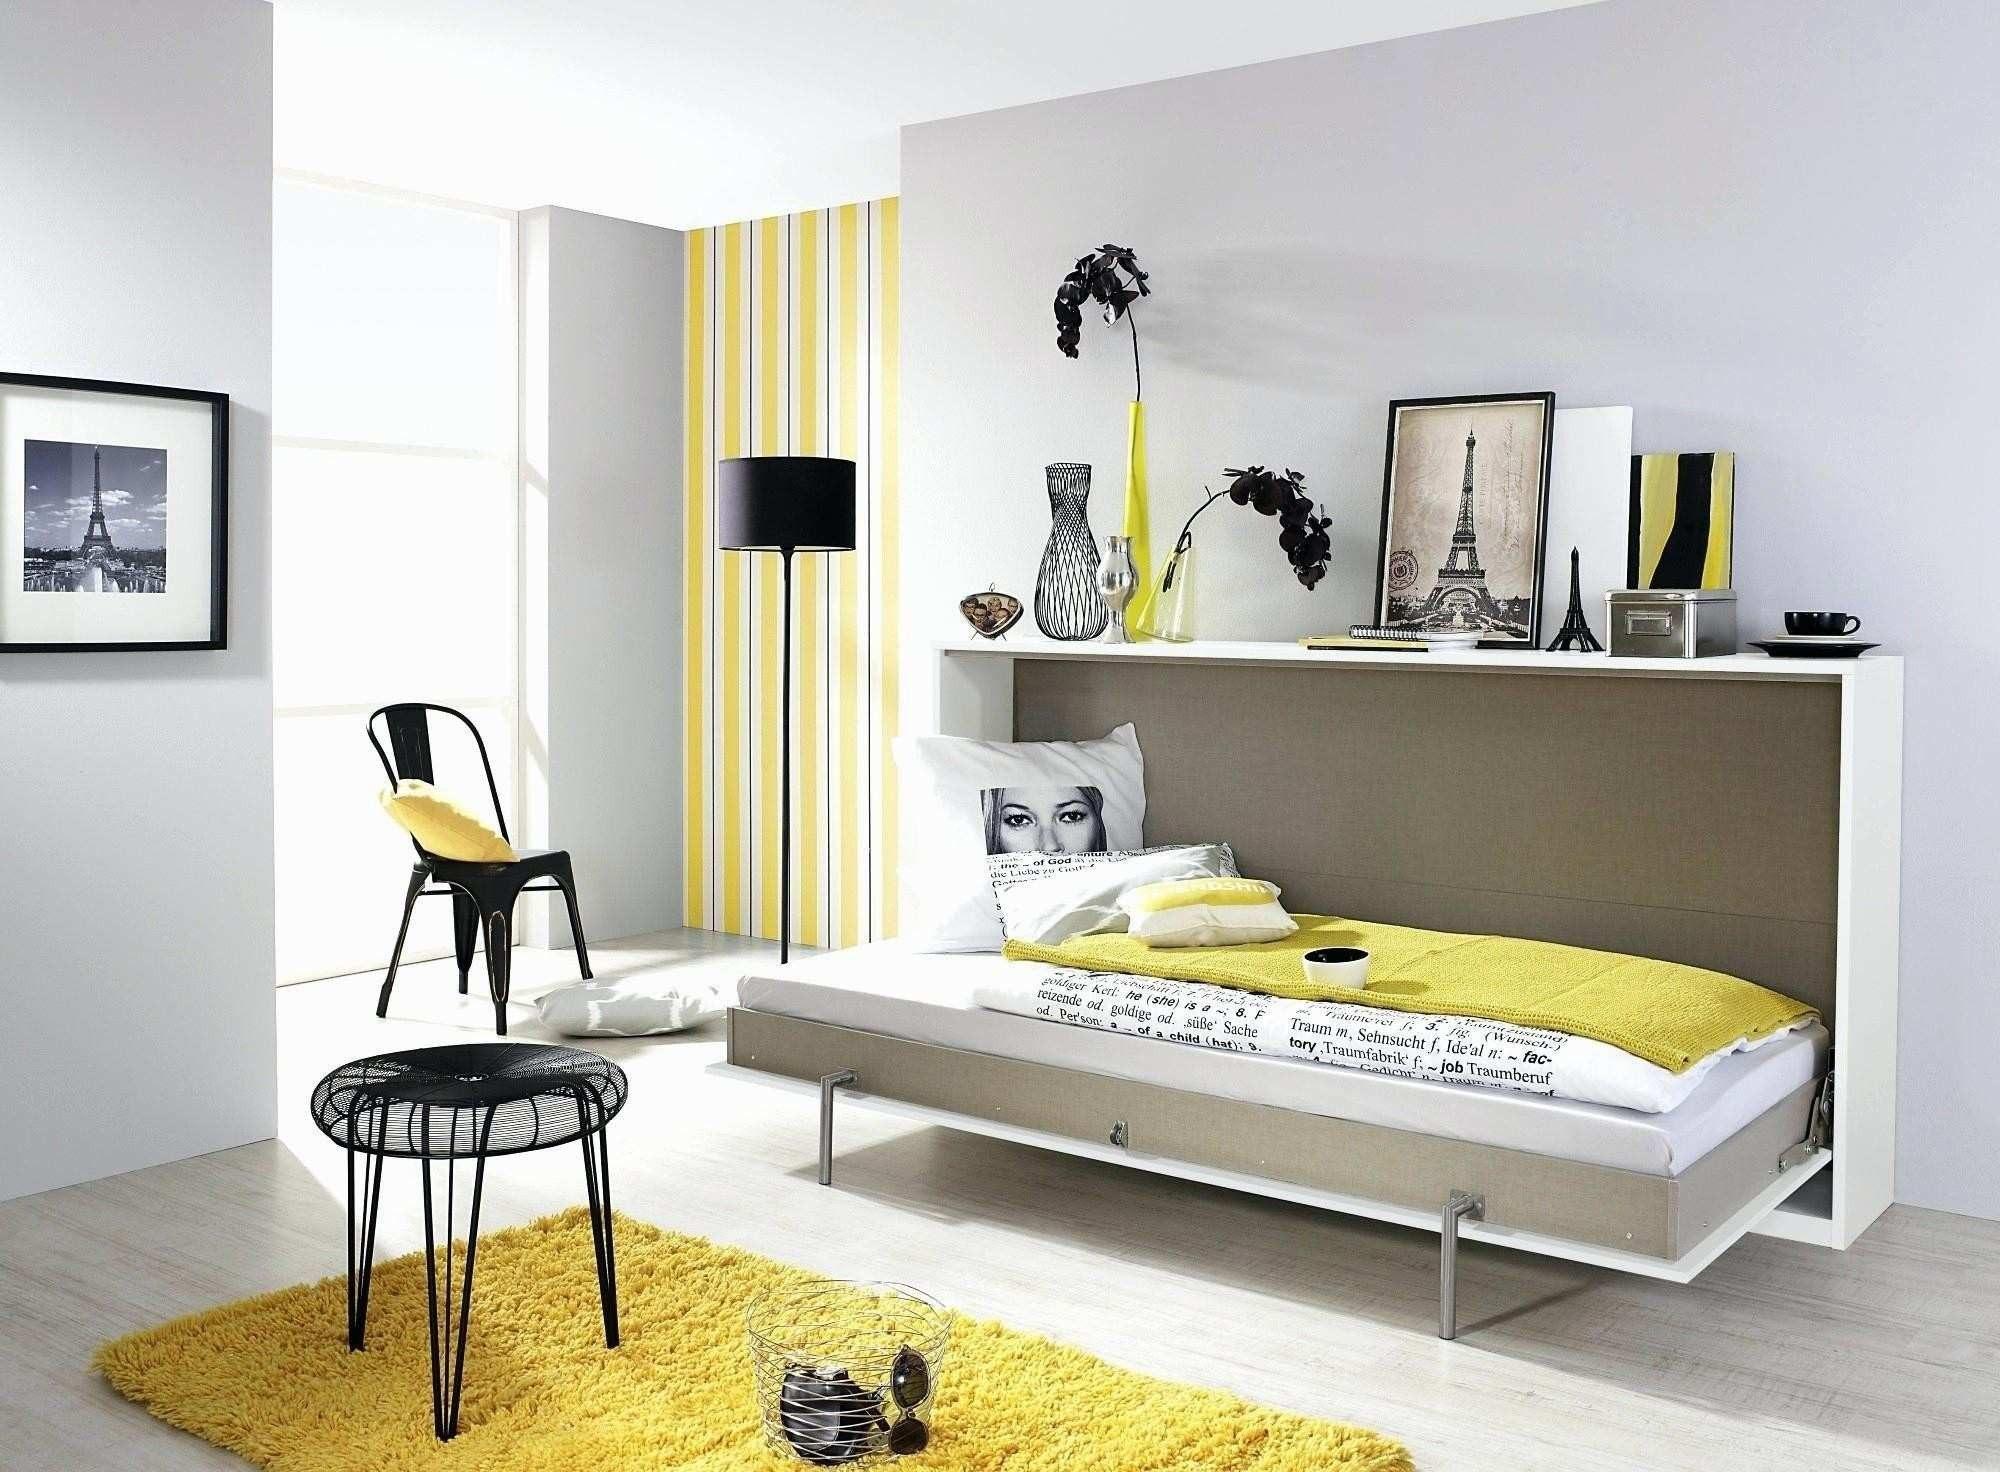 Ikea Lit Convertible Belle Belle Lit Armoire Escamotable Ikea Sur Lit Convertible 2 Places Ikea